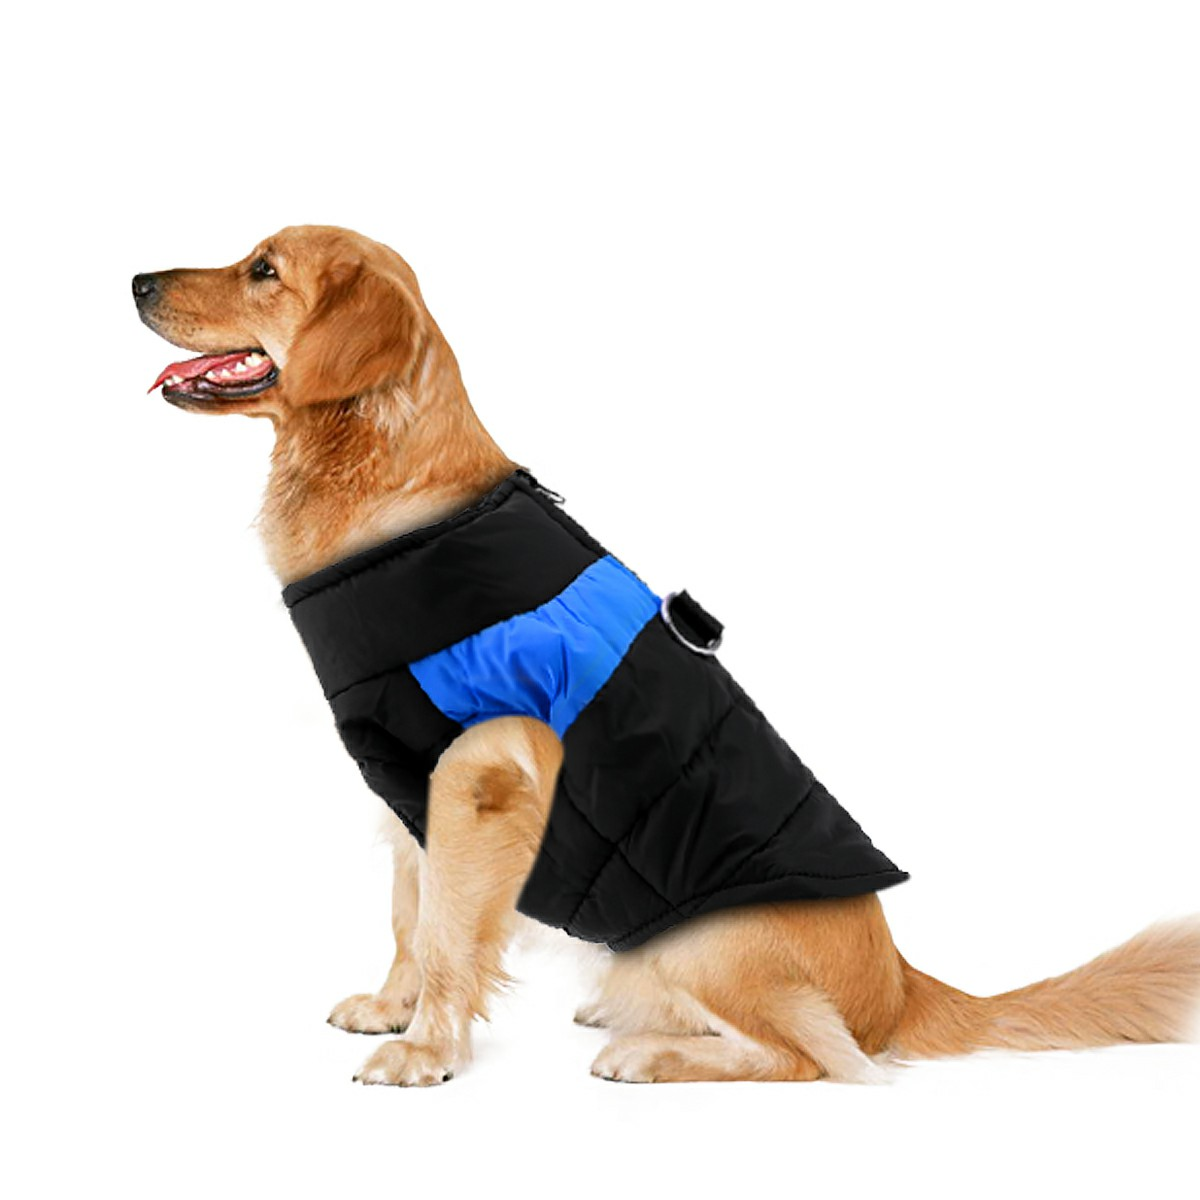 Comfy Soft Dog Vest Jacket Winter Waterproof Padded Pet Clothes Warm Vest Coat Size M - Blue